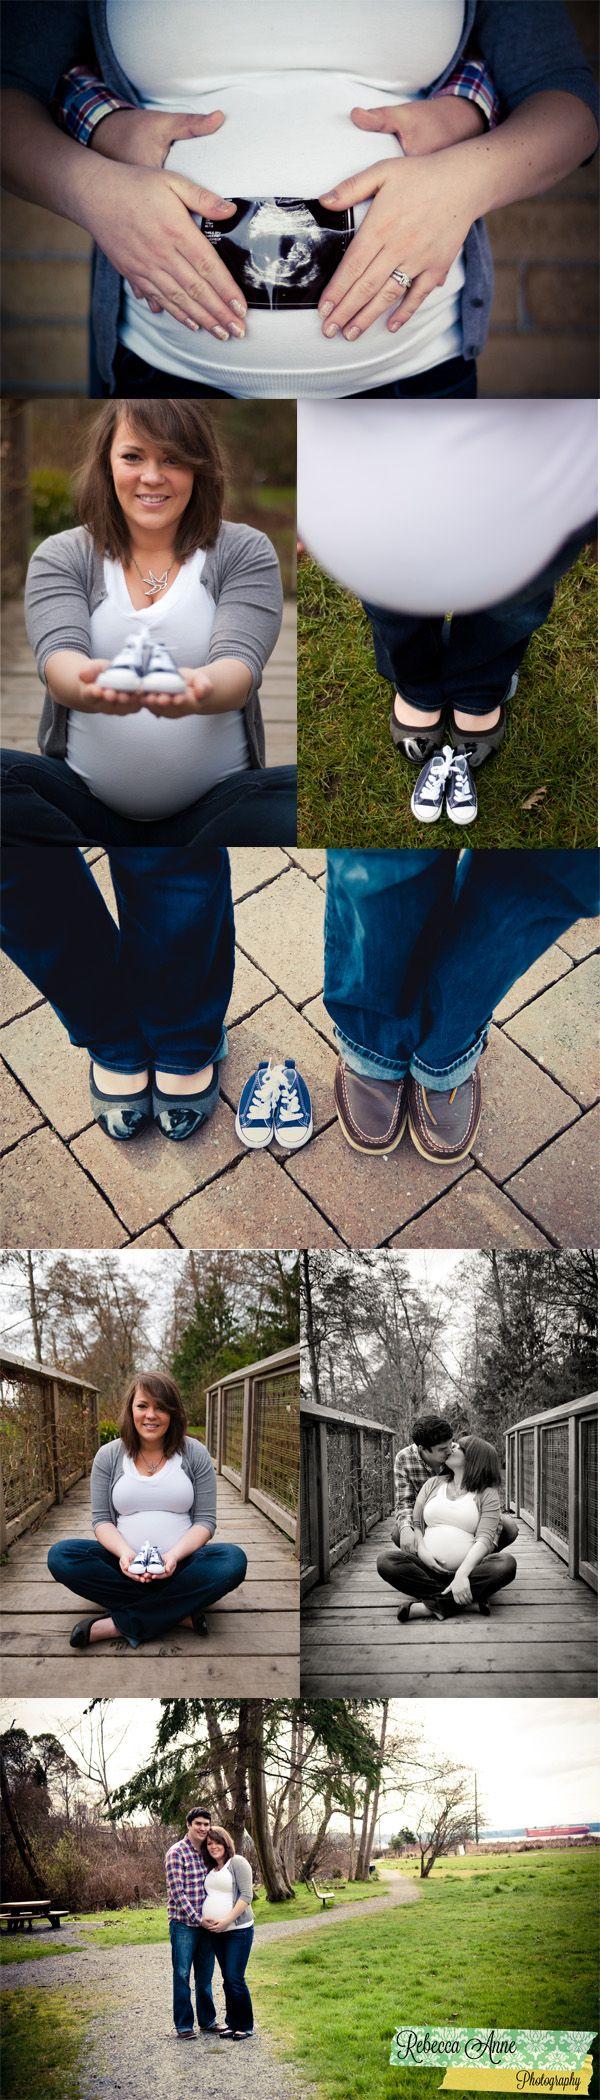 Maternity Pictures | Tacoma, WA  Photographer | Rebecca Anne photography #Maternity #Pictures #Poses